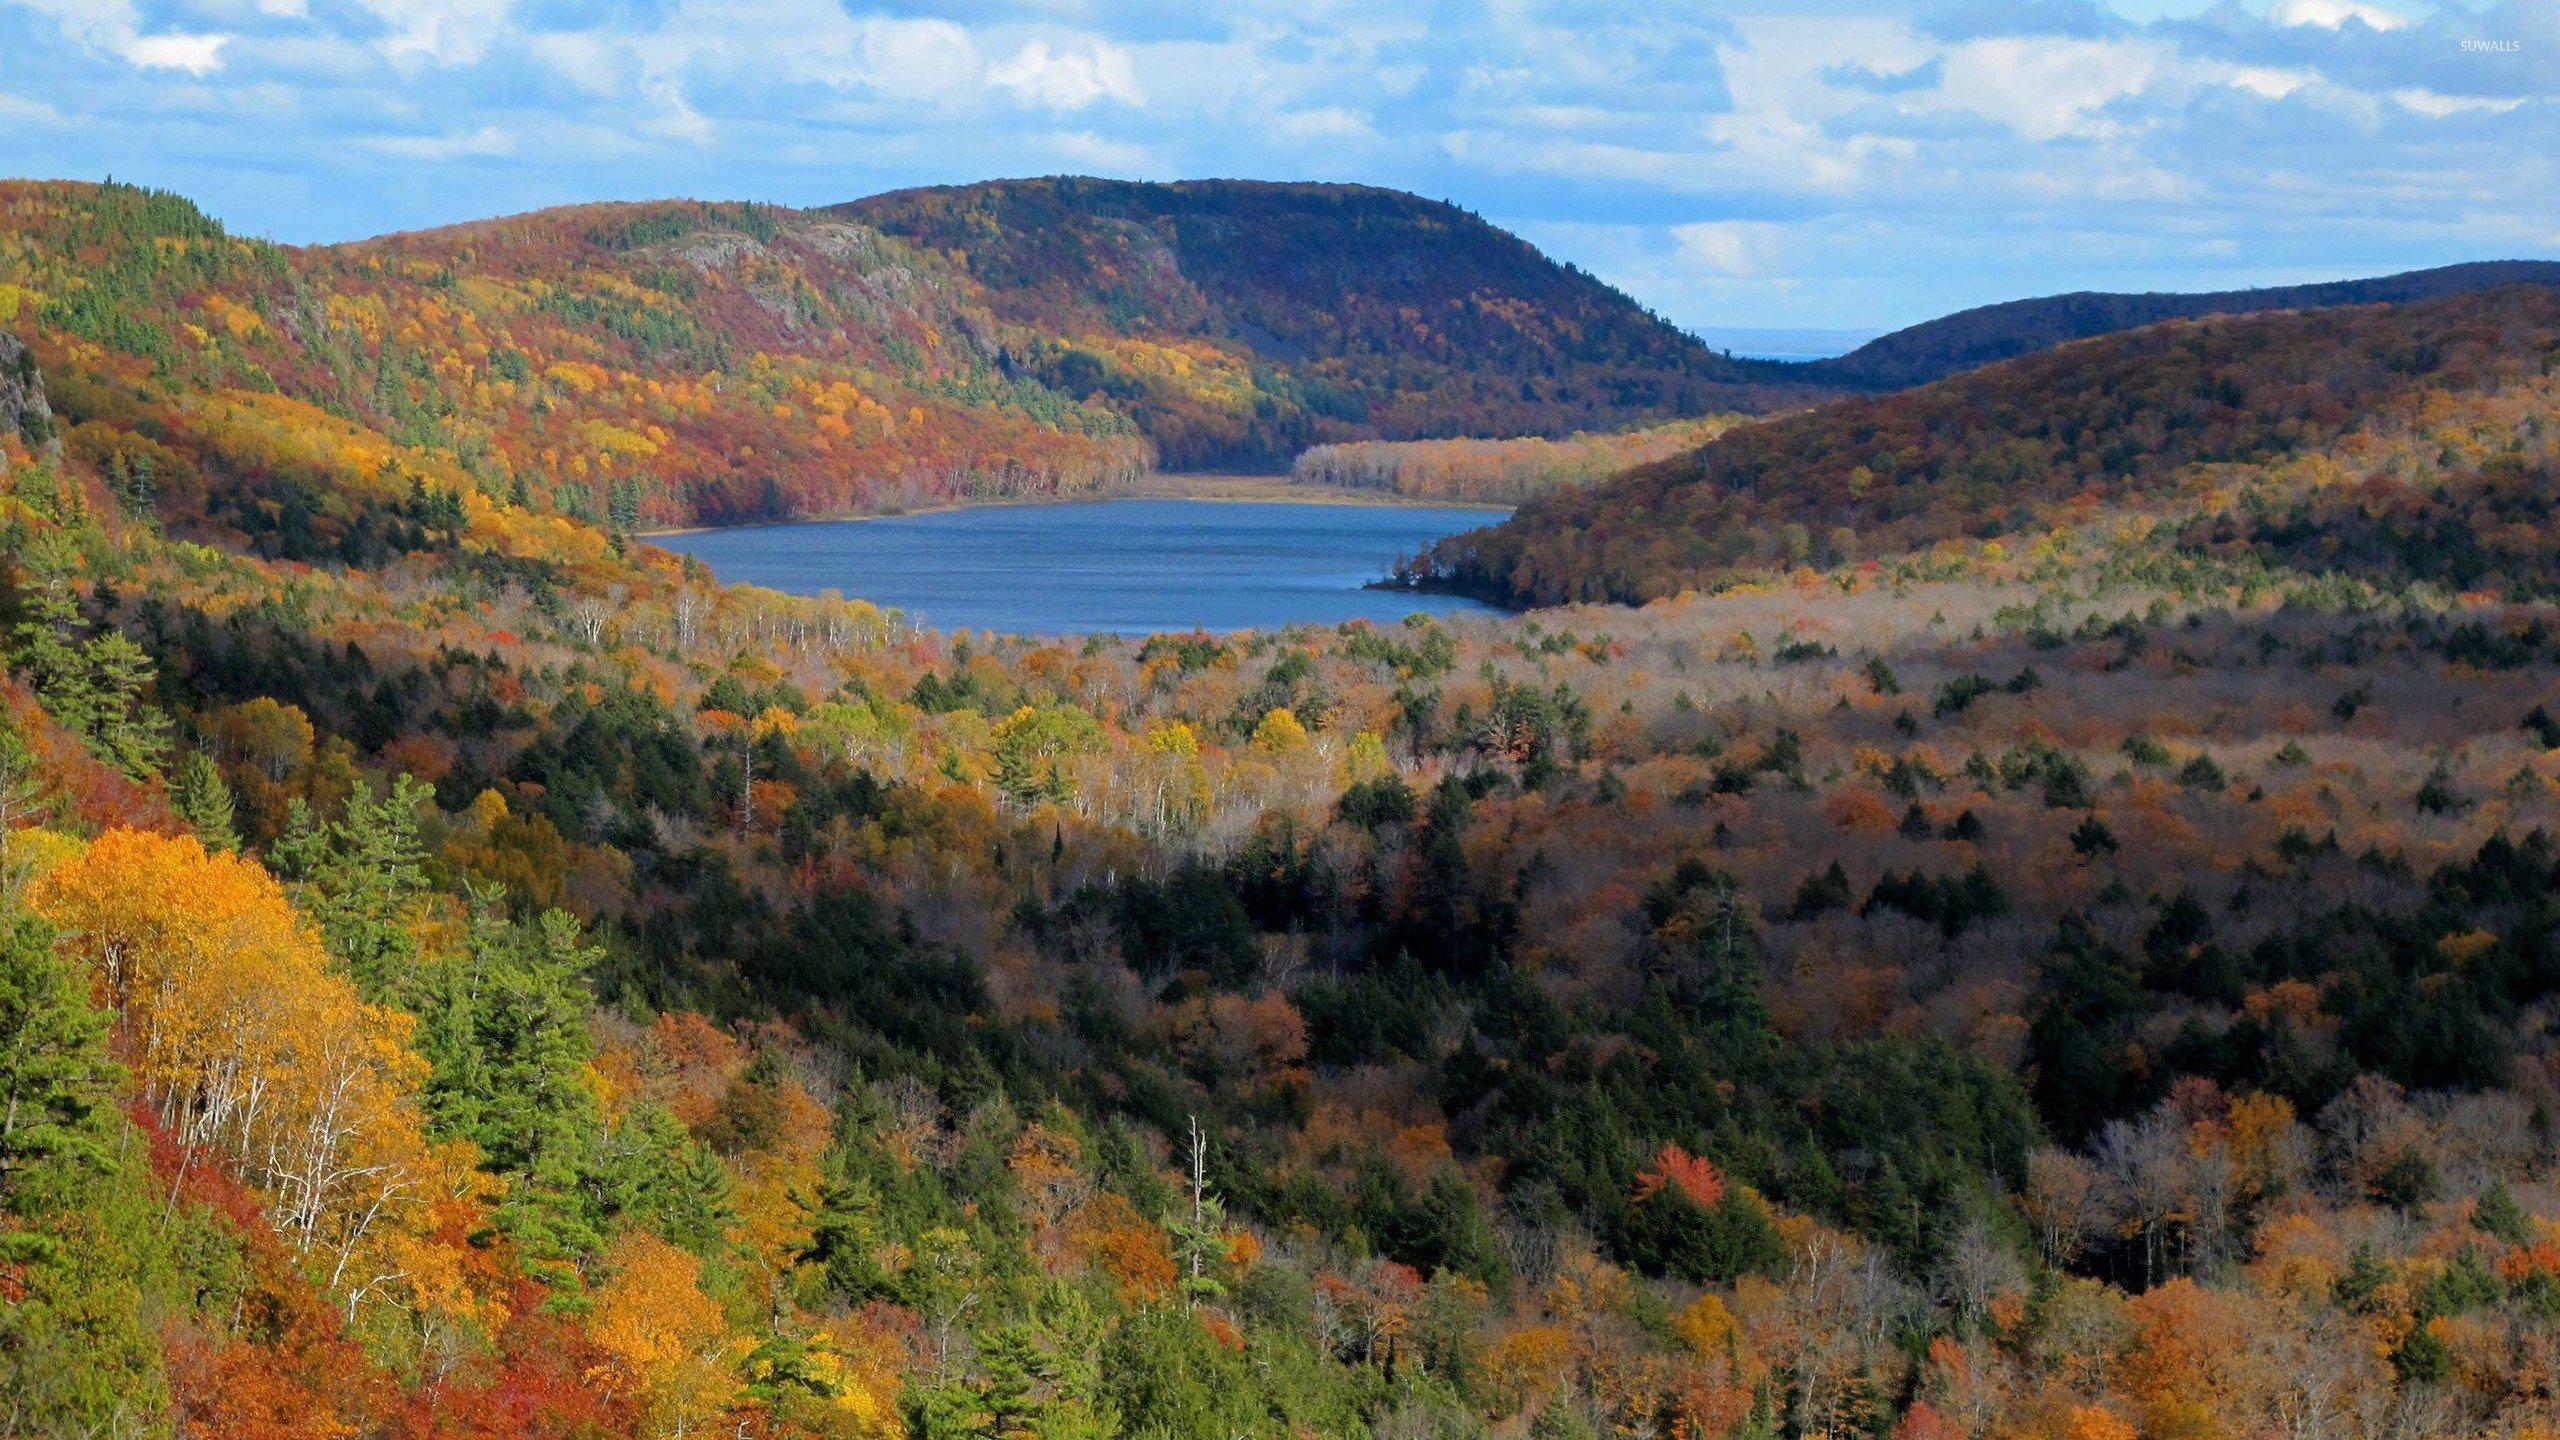 Upper Peninsula of Michigan wallpaper   Nature wallpapers   41457 2560x1440